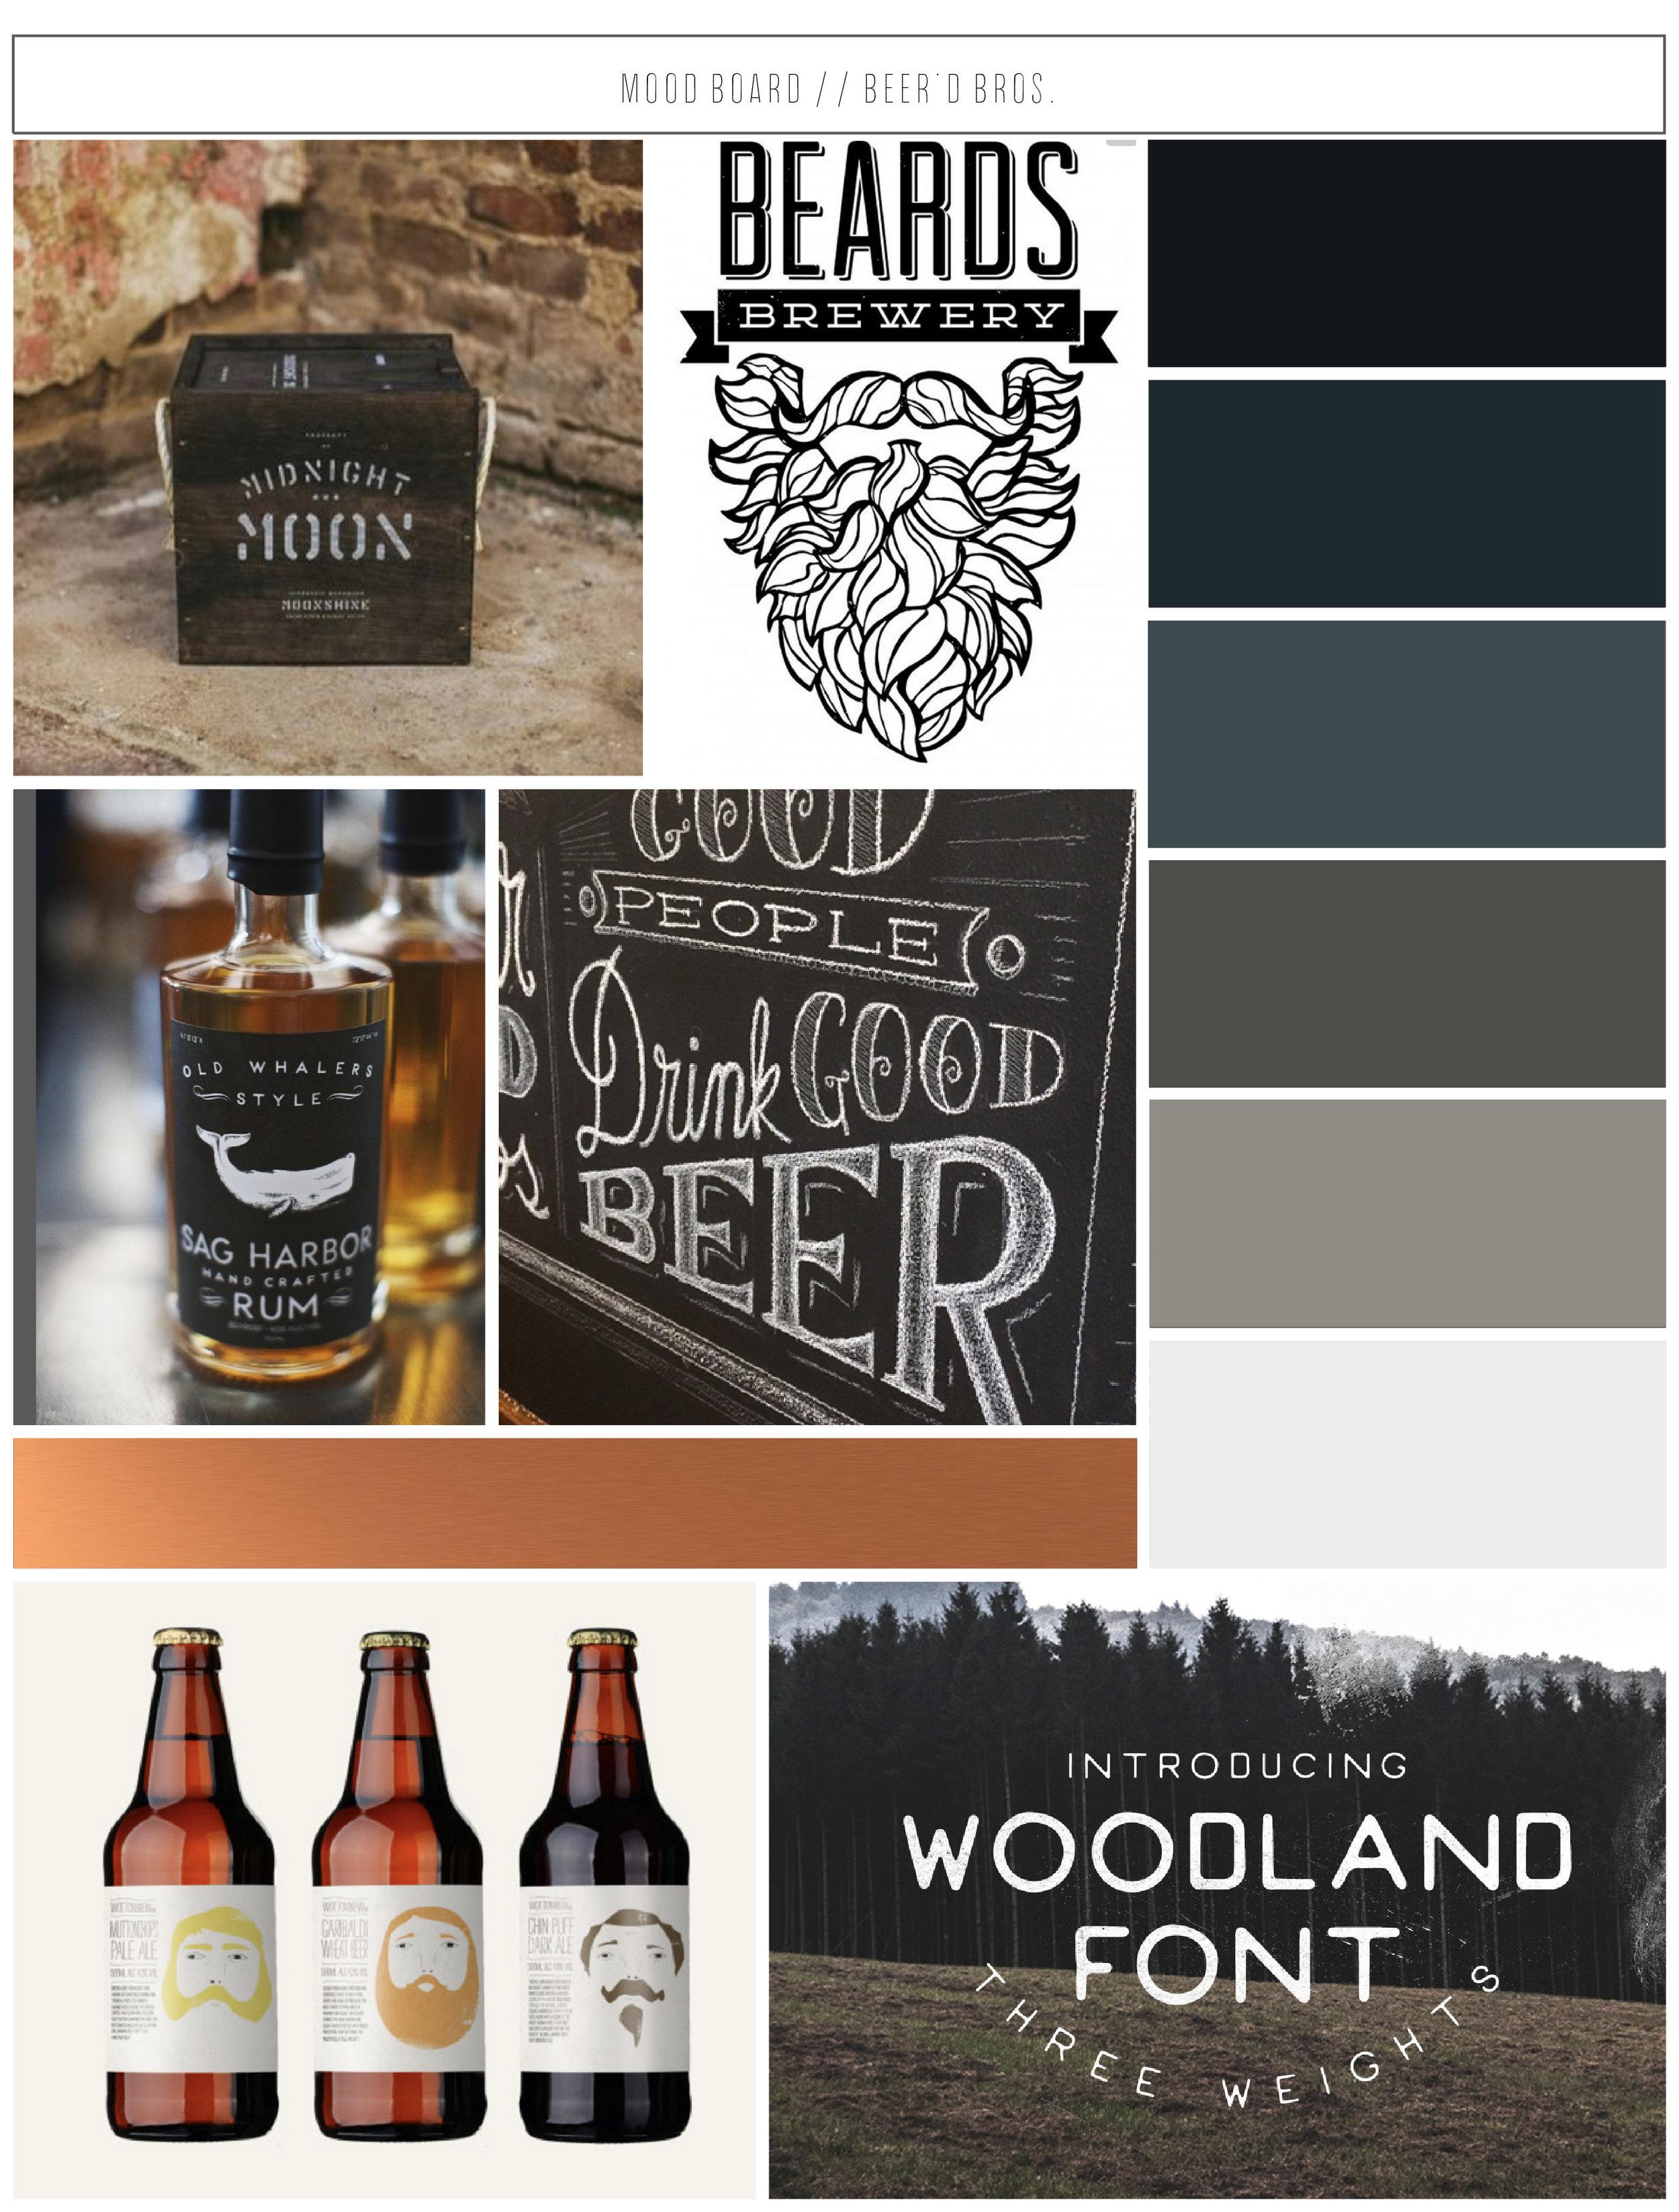 Beer'd Bros. Mood Board